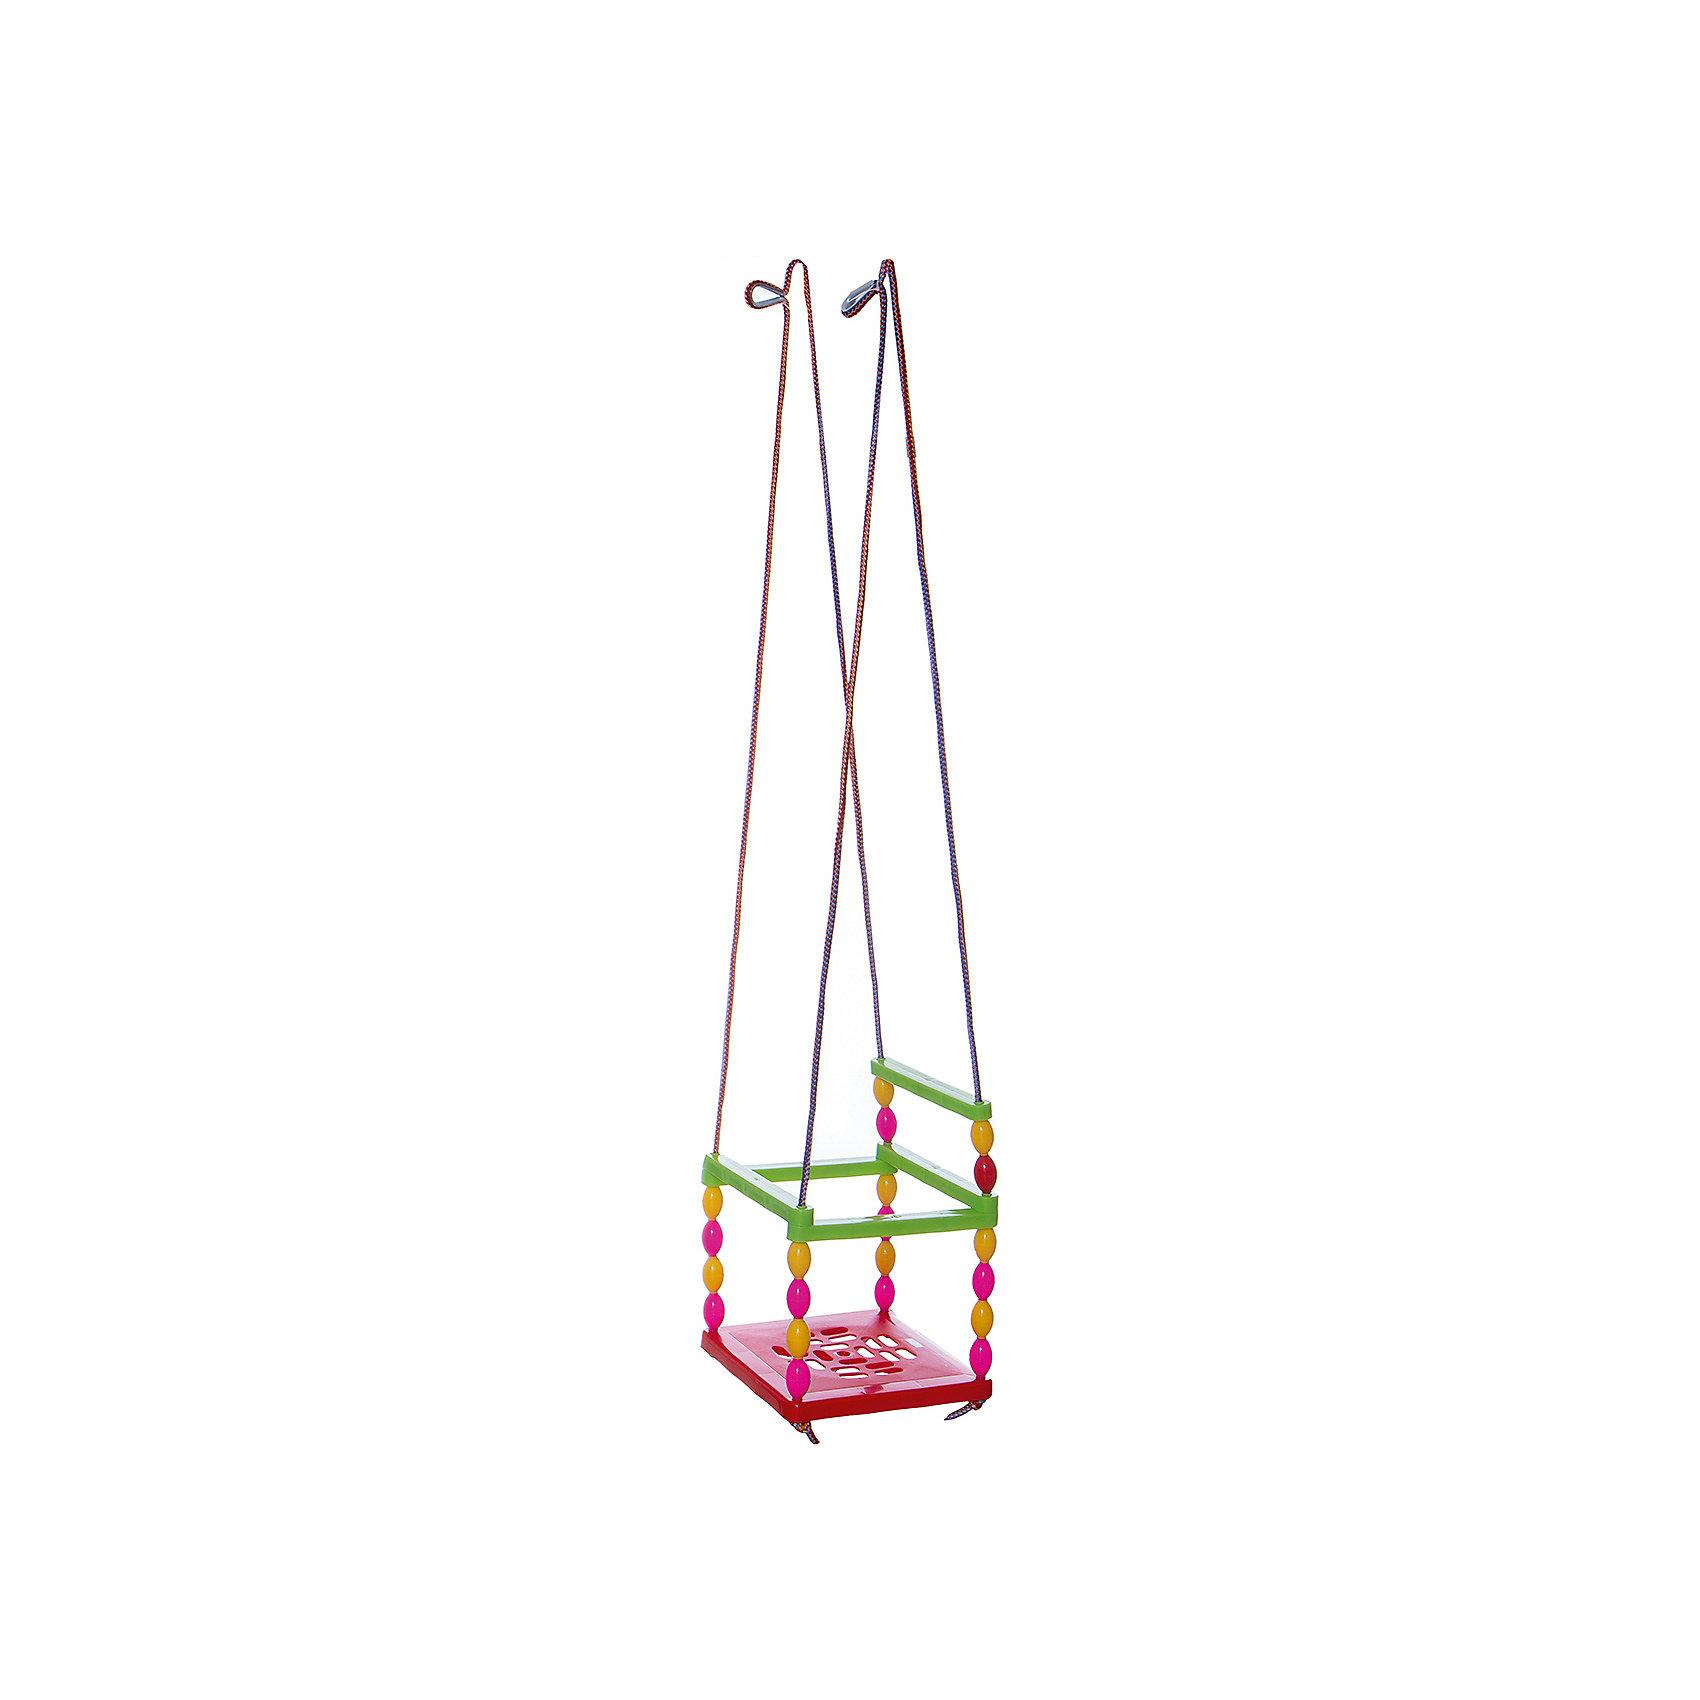 Стеллар Стеллар Качели пластмассовые (со спинкой) стеллар погремушка дудочка стеллар